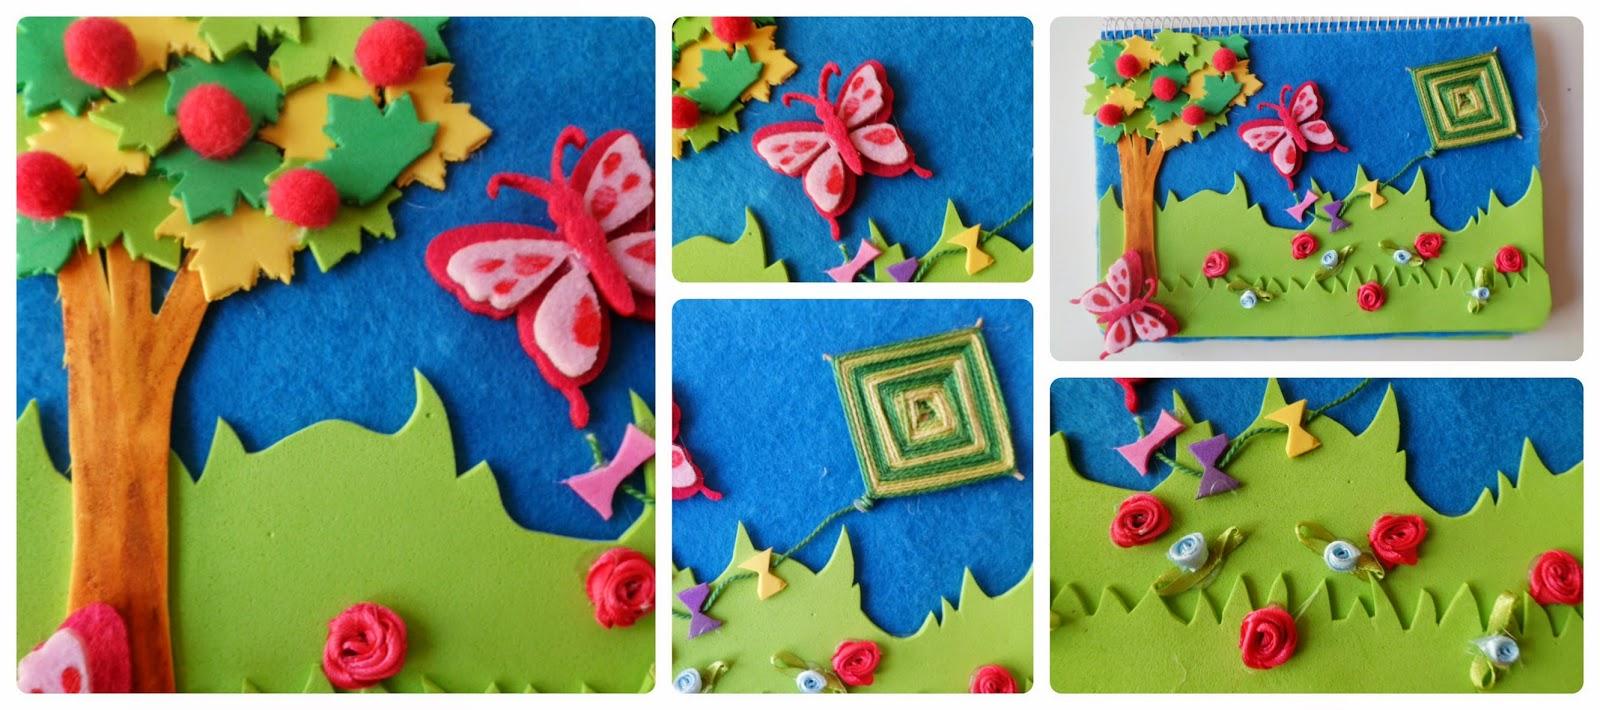 Materiales diy libreta decorada con goma eva para - Goma eva decorada ...